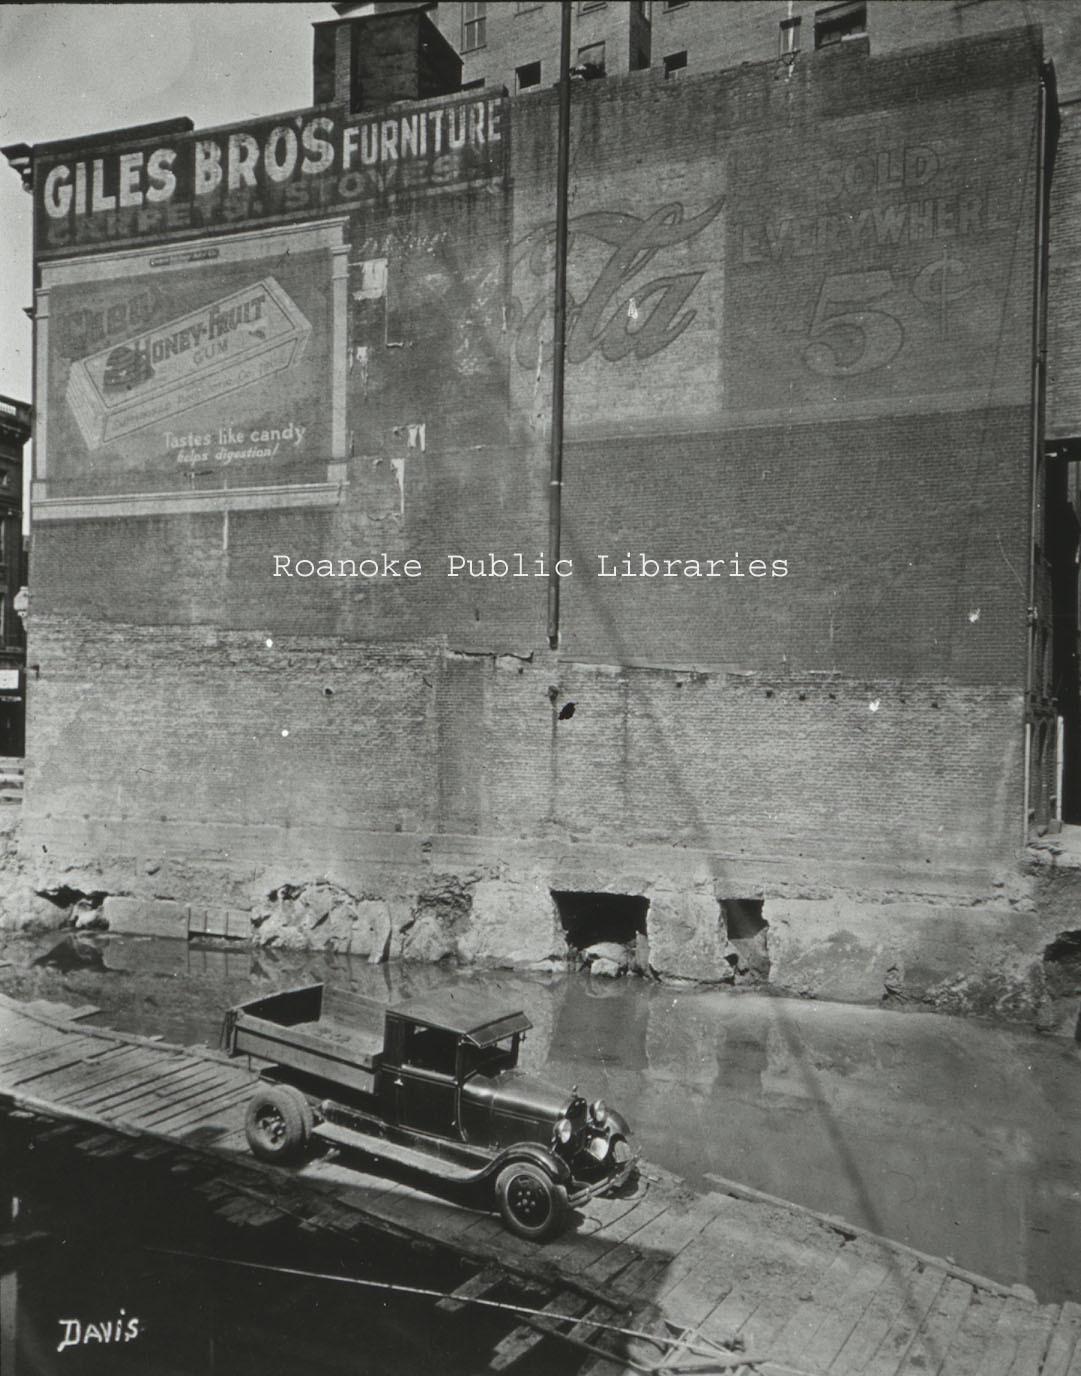 Davis GL 80 Giles Brothers Furniture.jpg